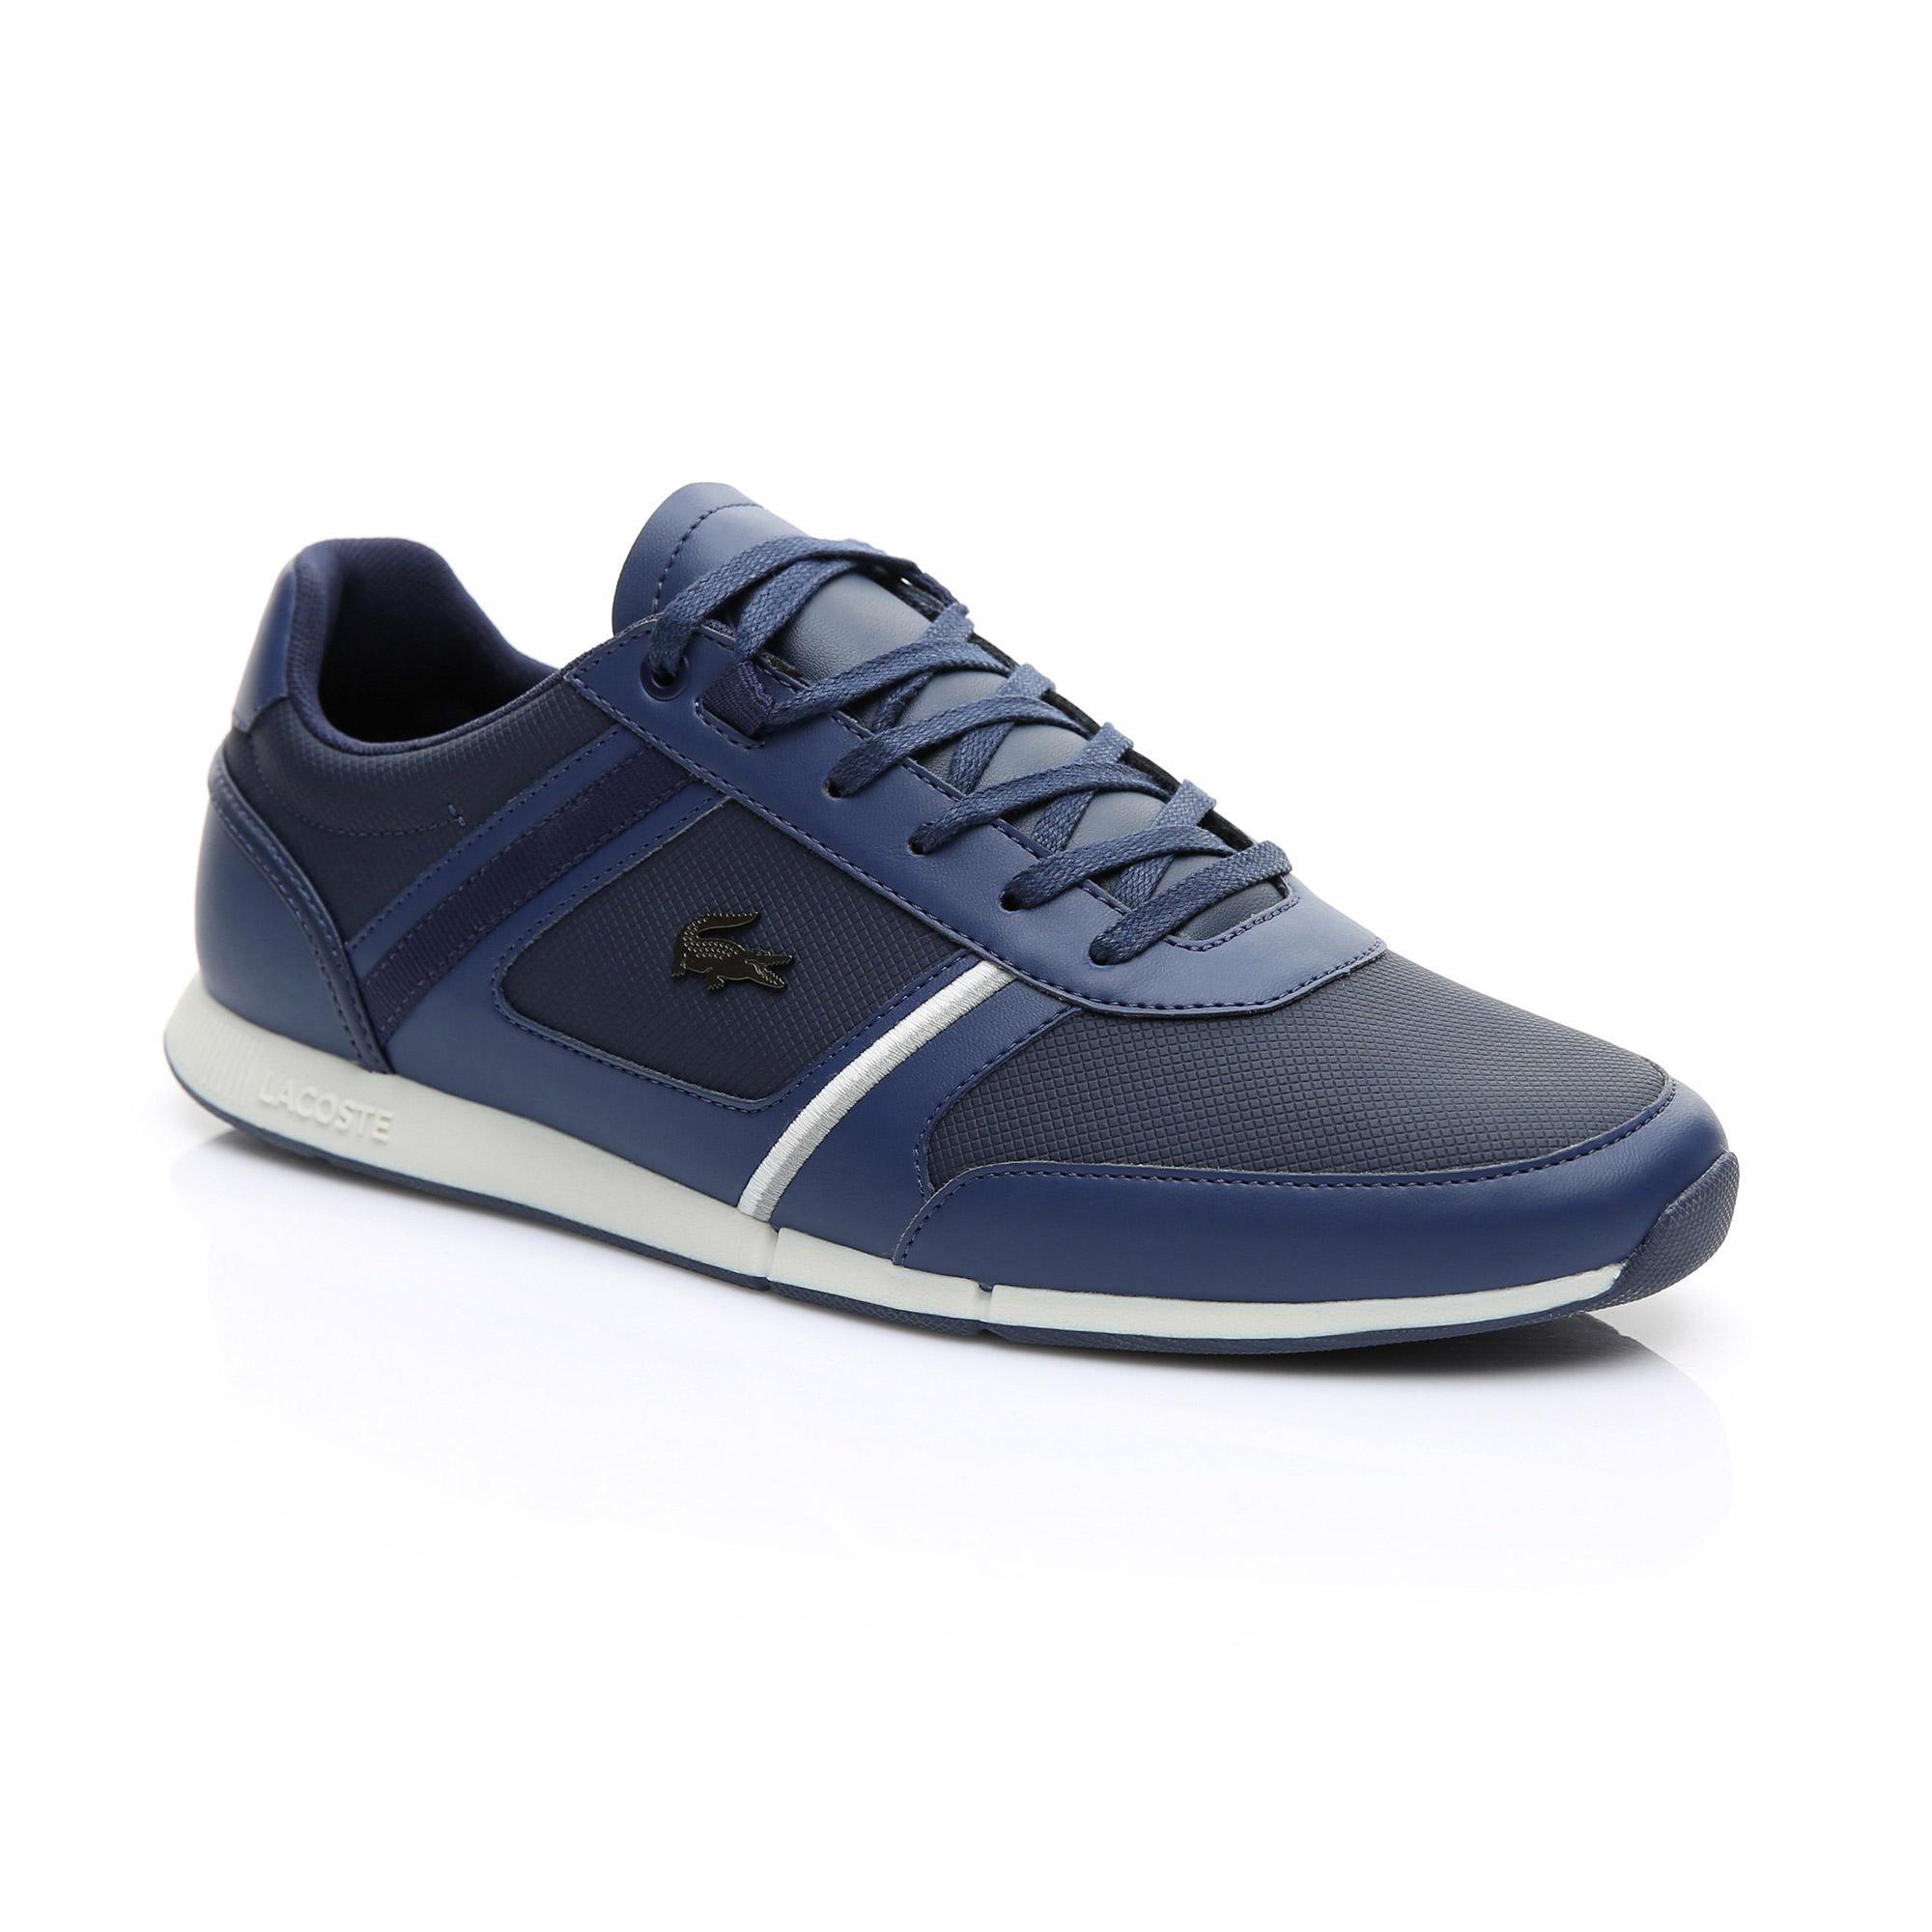 Lacoste Menerva 119 1 Męskie Sneakersy